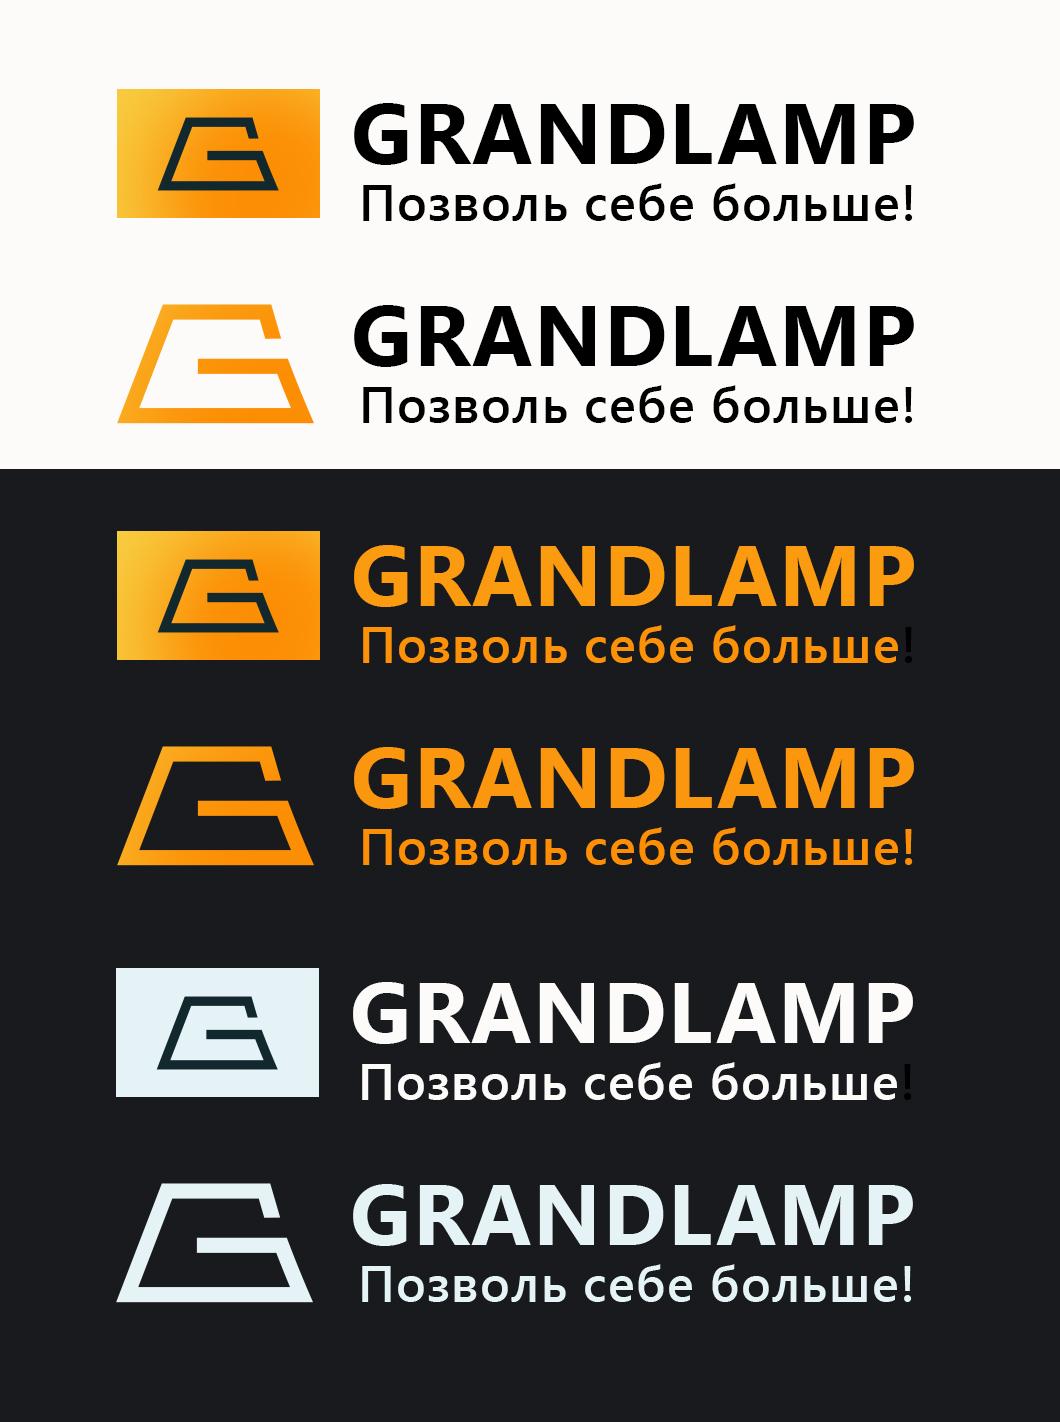 Разработка логотипа и элементов фирменного стиля фото f_55757dfd38417796.jpg